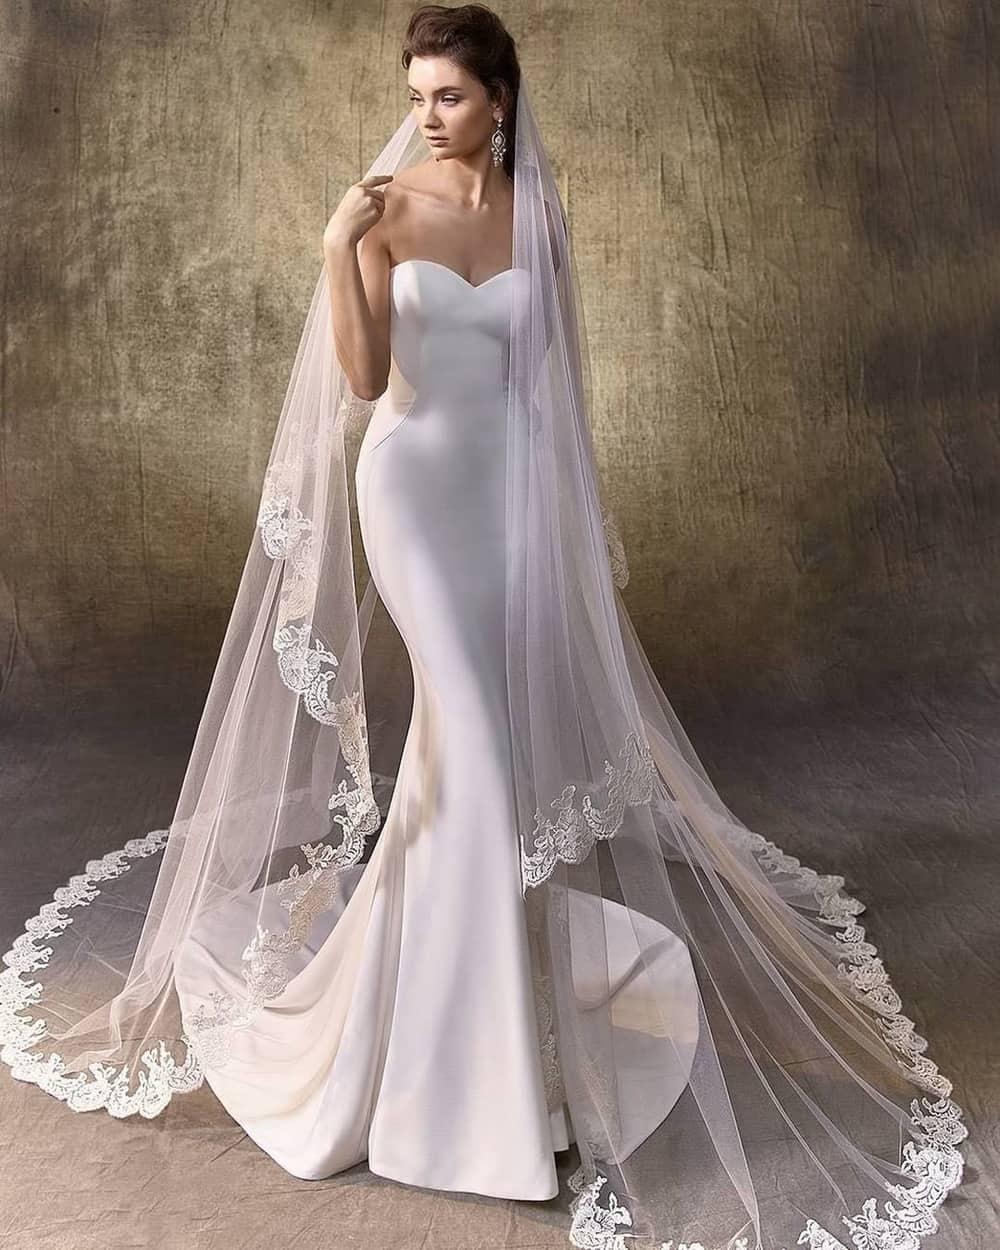 Inspirasi Wedding Veil Panjang untuk Pengantin Wanita